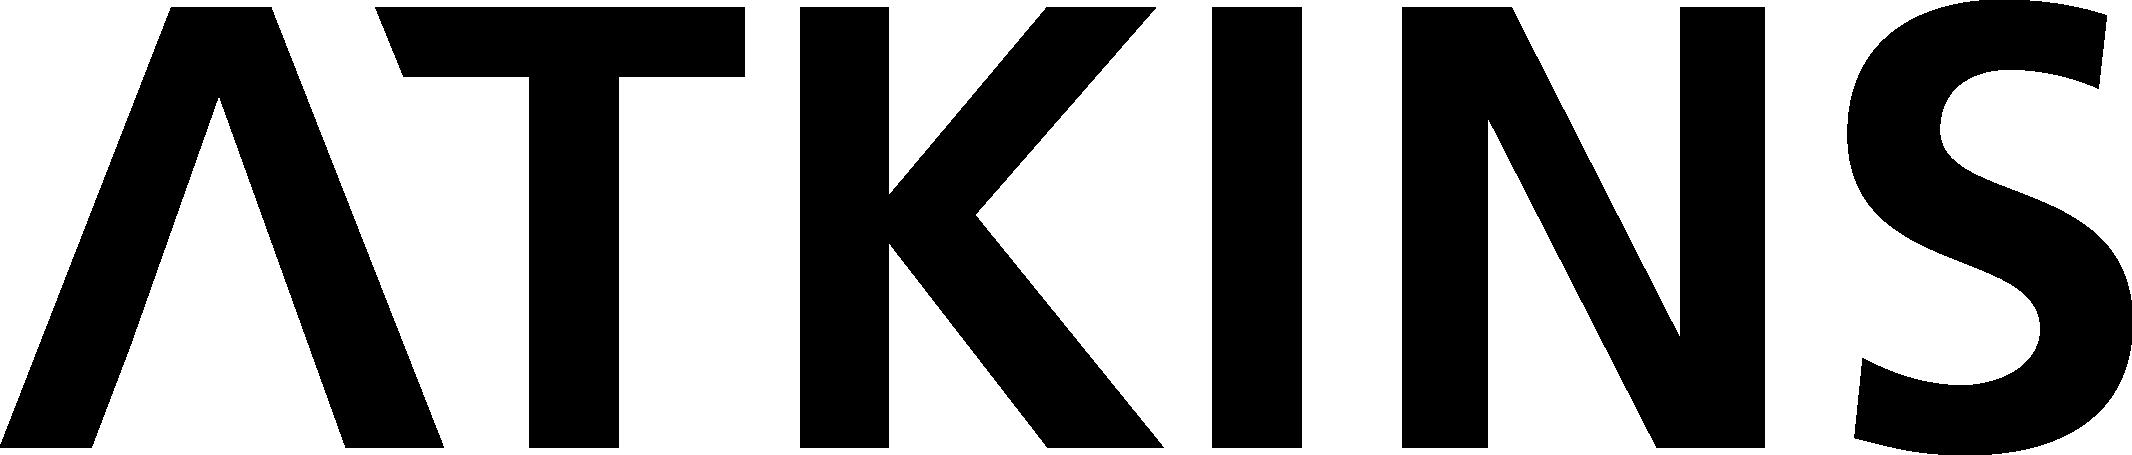 Atkins logo Black [Converted].png